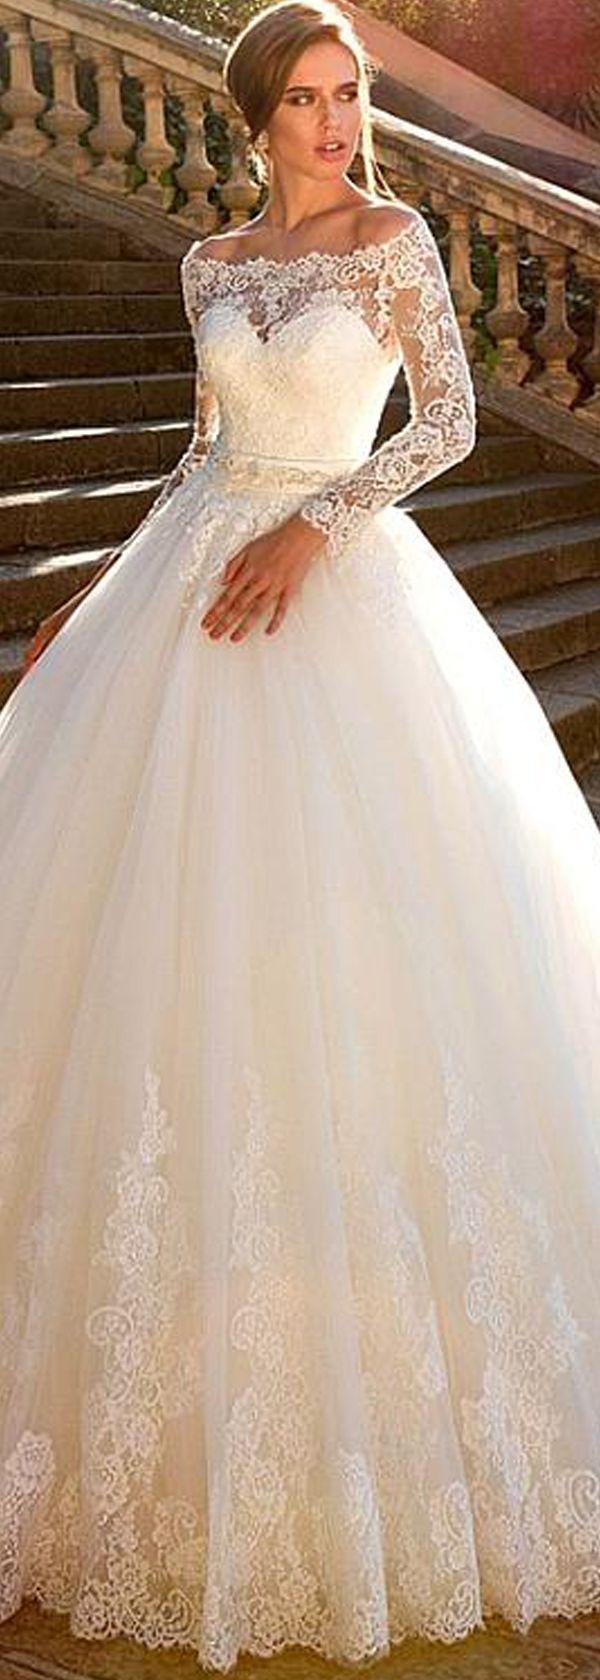 Wedding-Dresses-1159